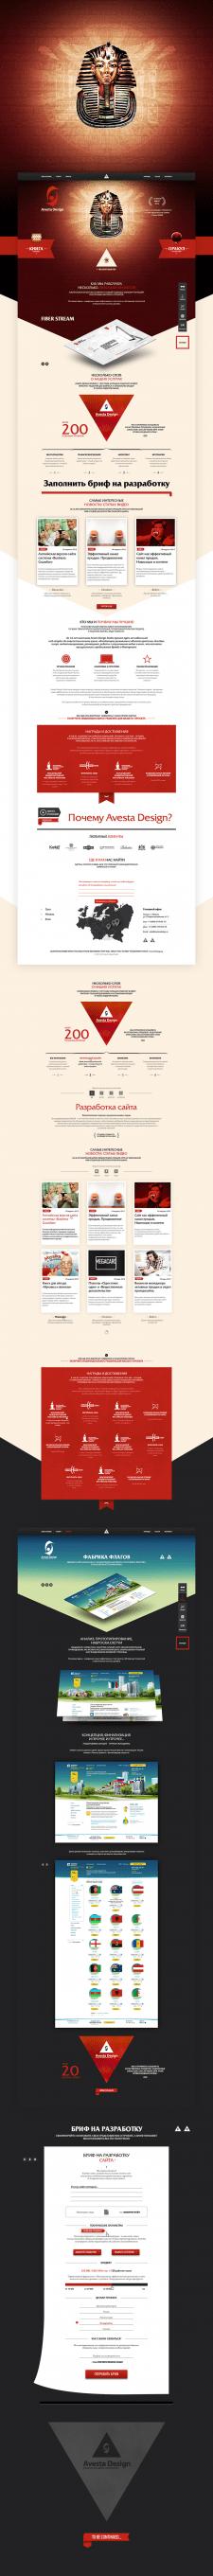 Avesta Design. Concept